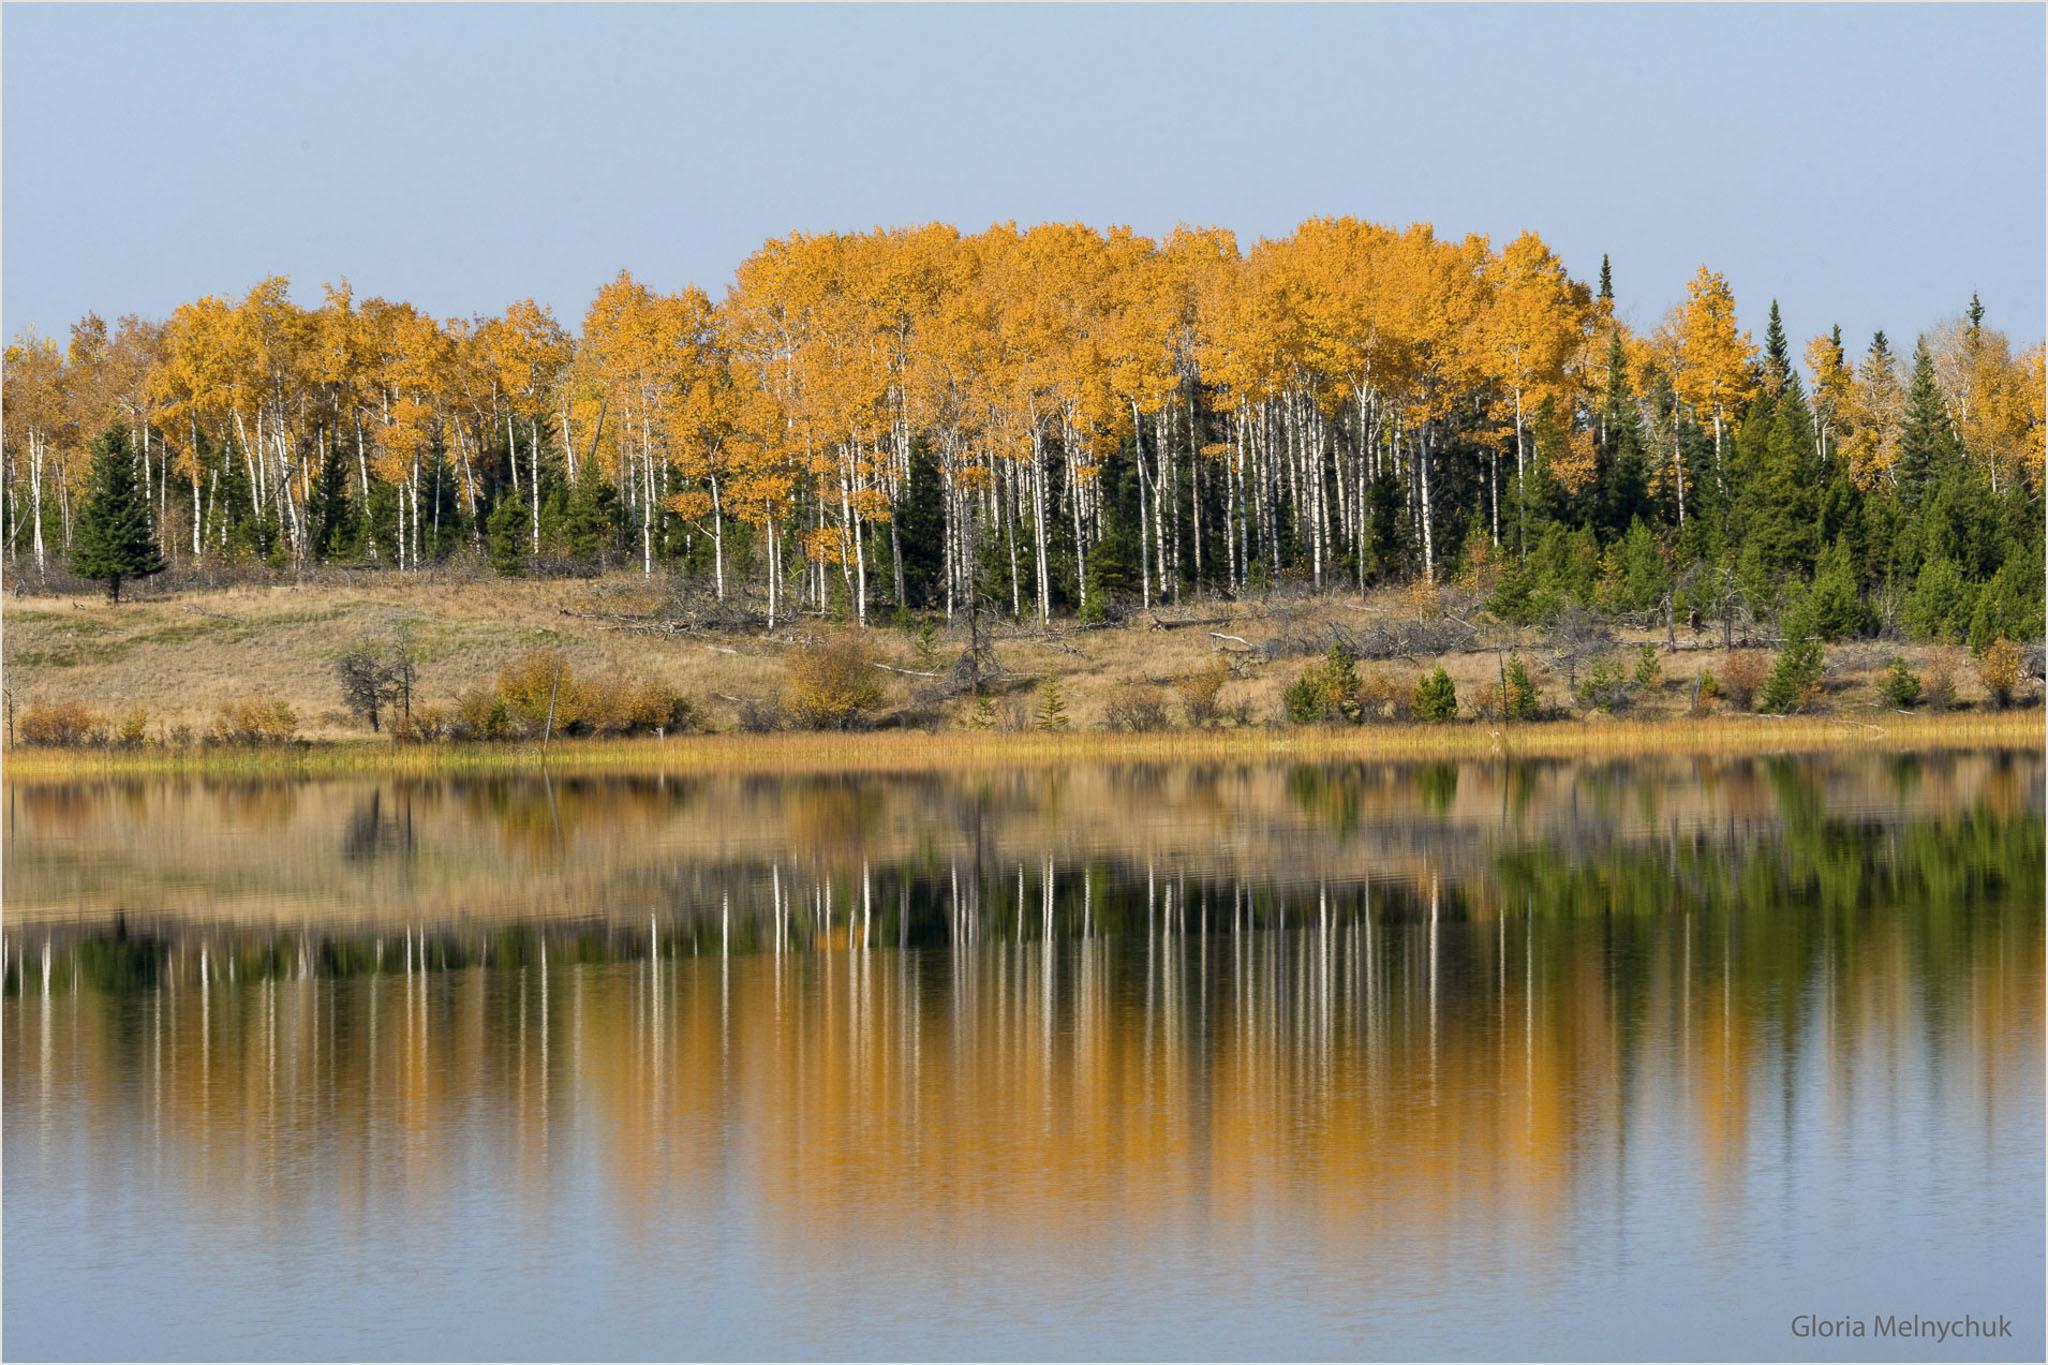 Fall Reflections 3042 - Gloria Melnychuk